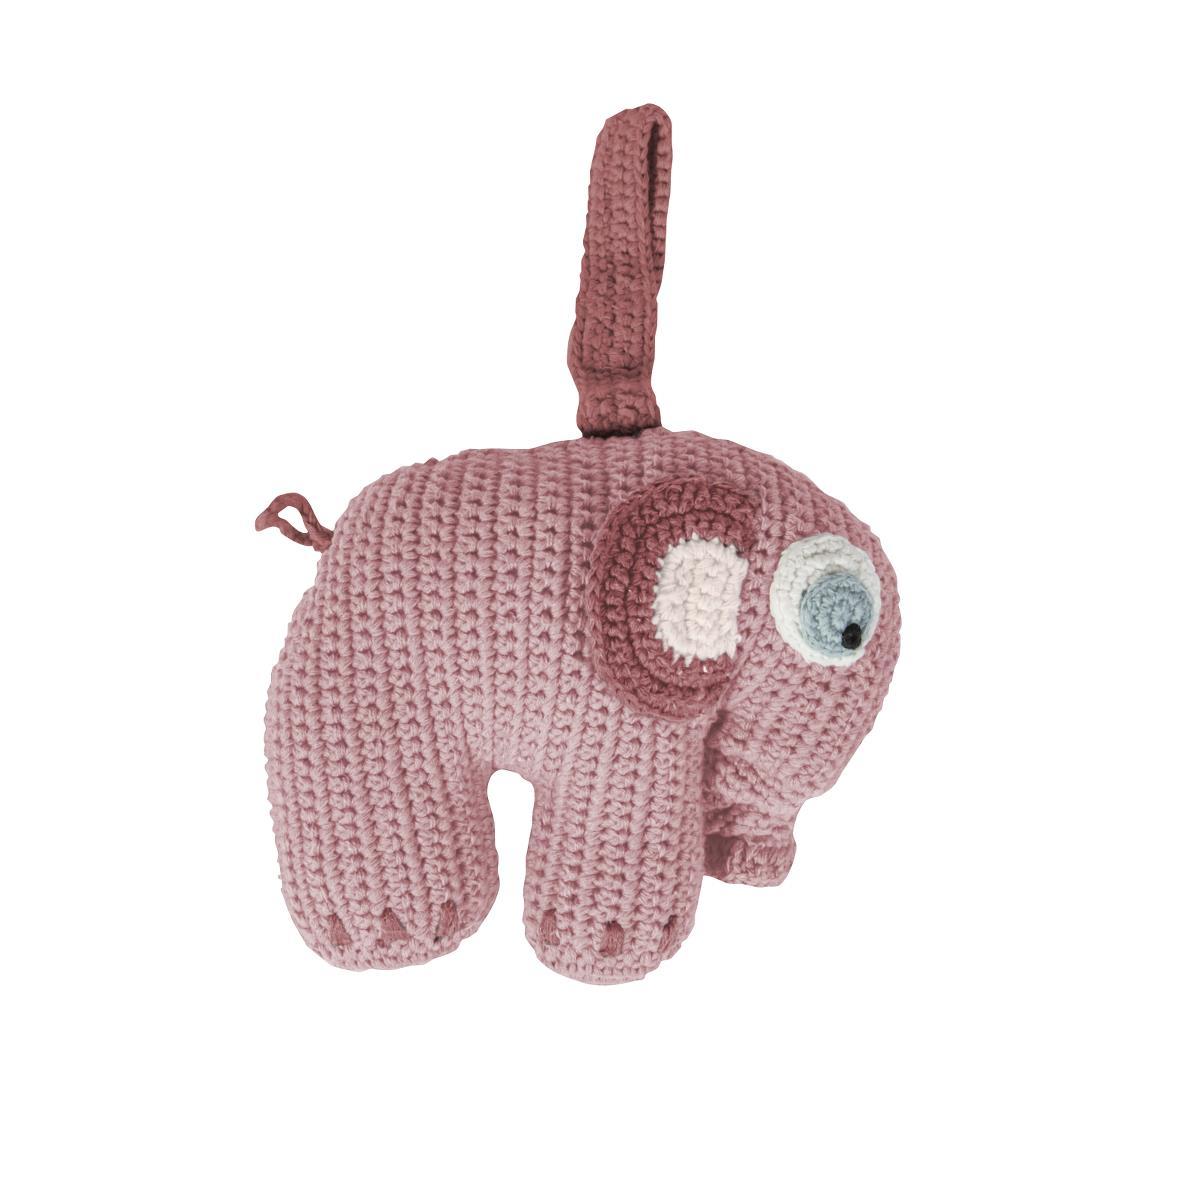 sebra Häkel-Spieluhr, Elephant, altrosa 3013202 - 01